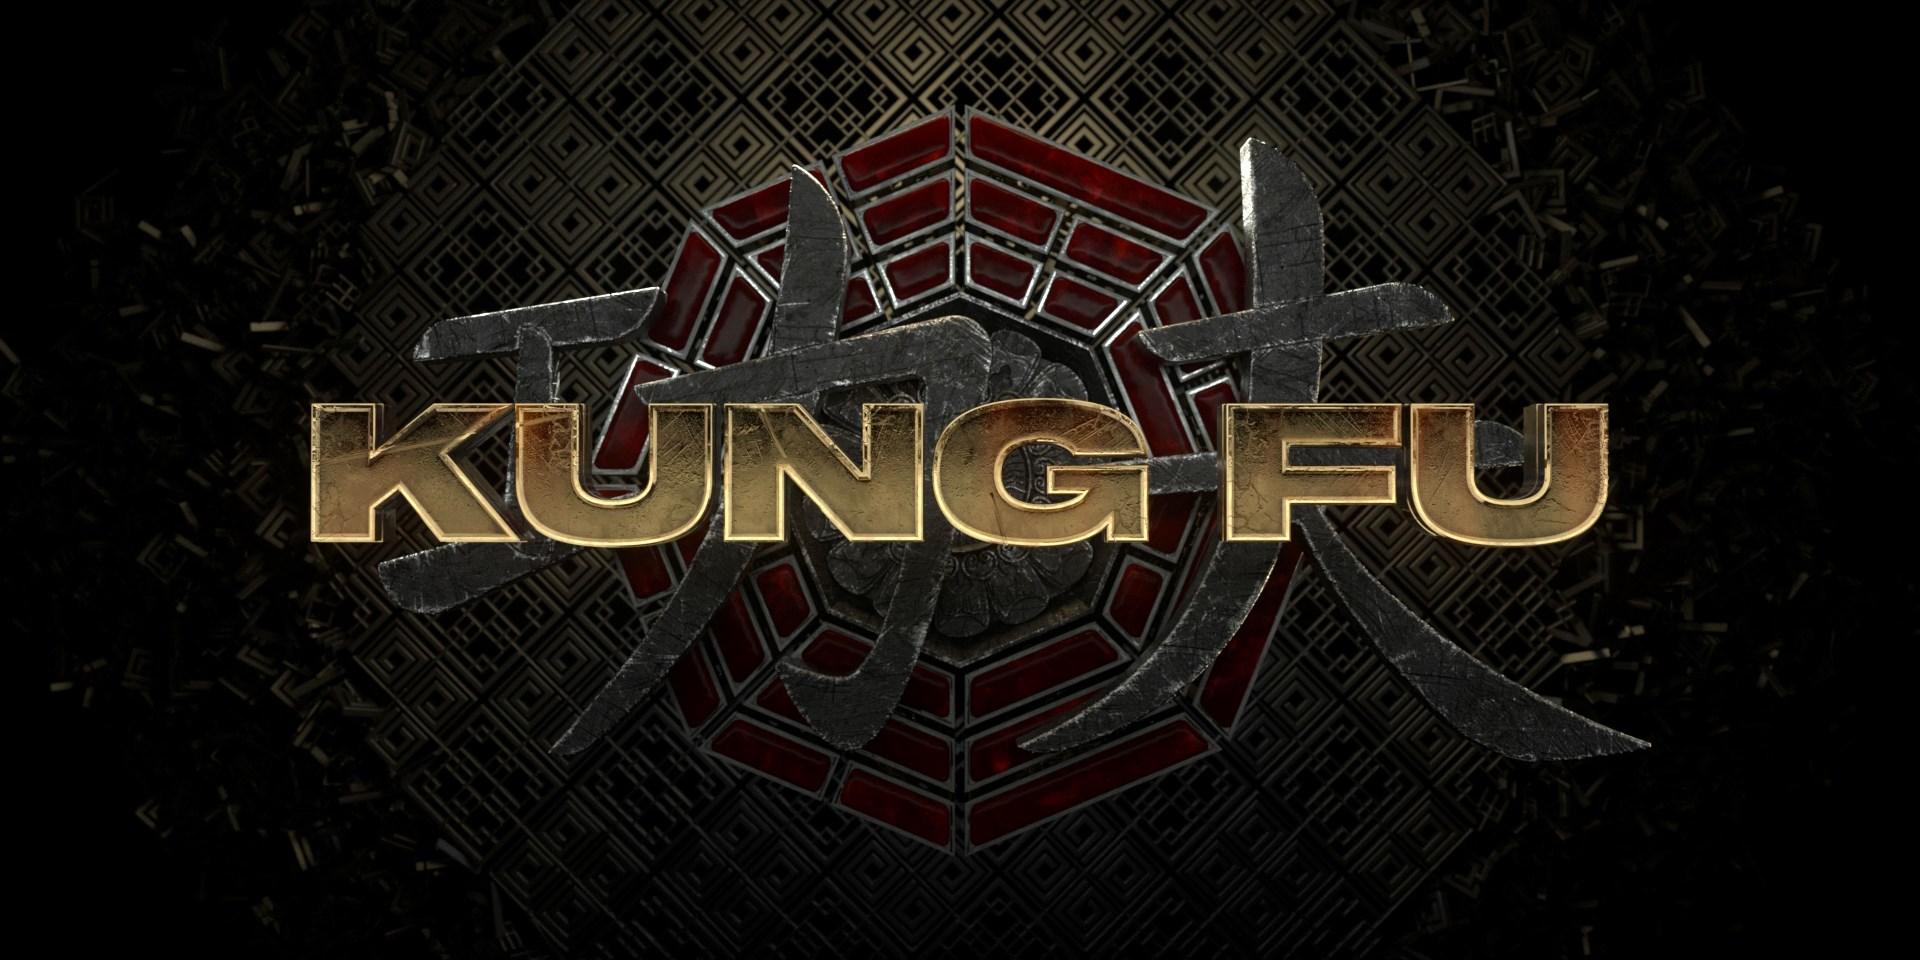 Kung Fu Temporada 1 (2021) 1080p WEB-DL Latino